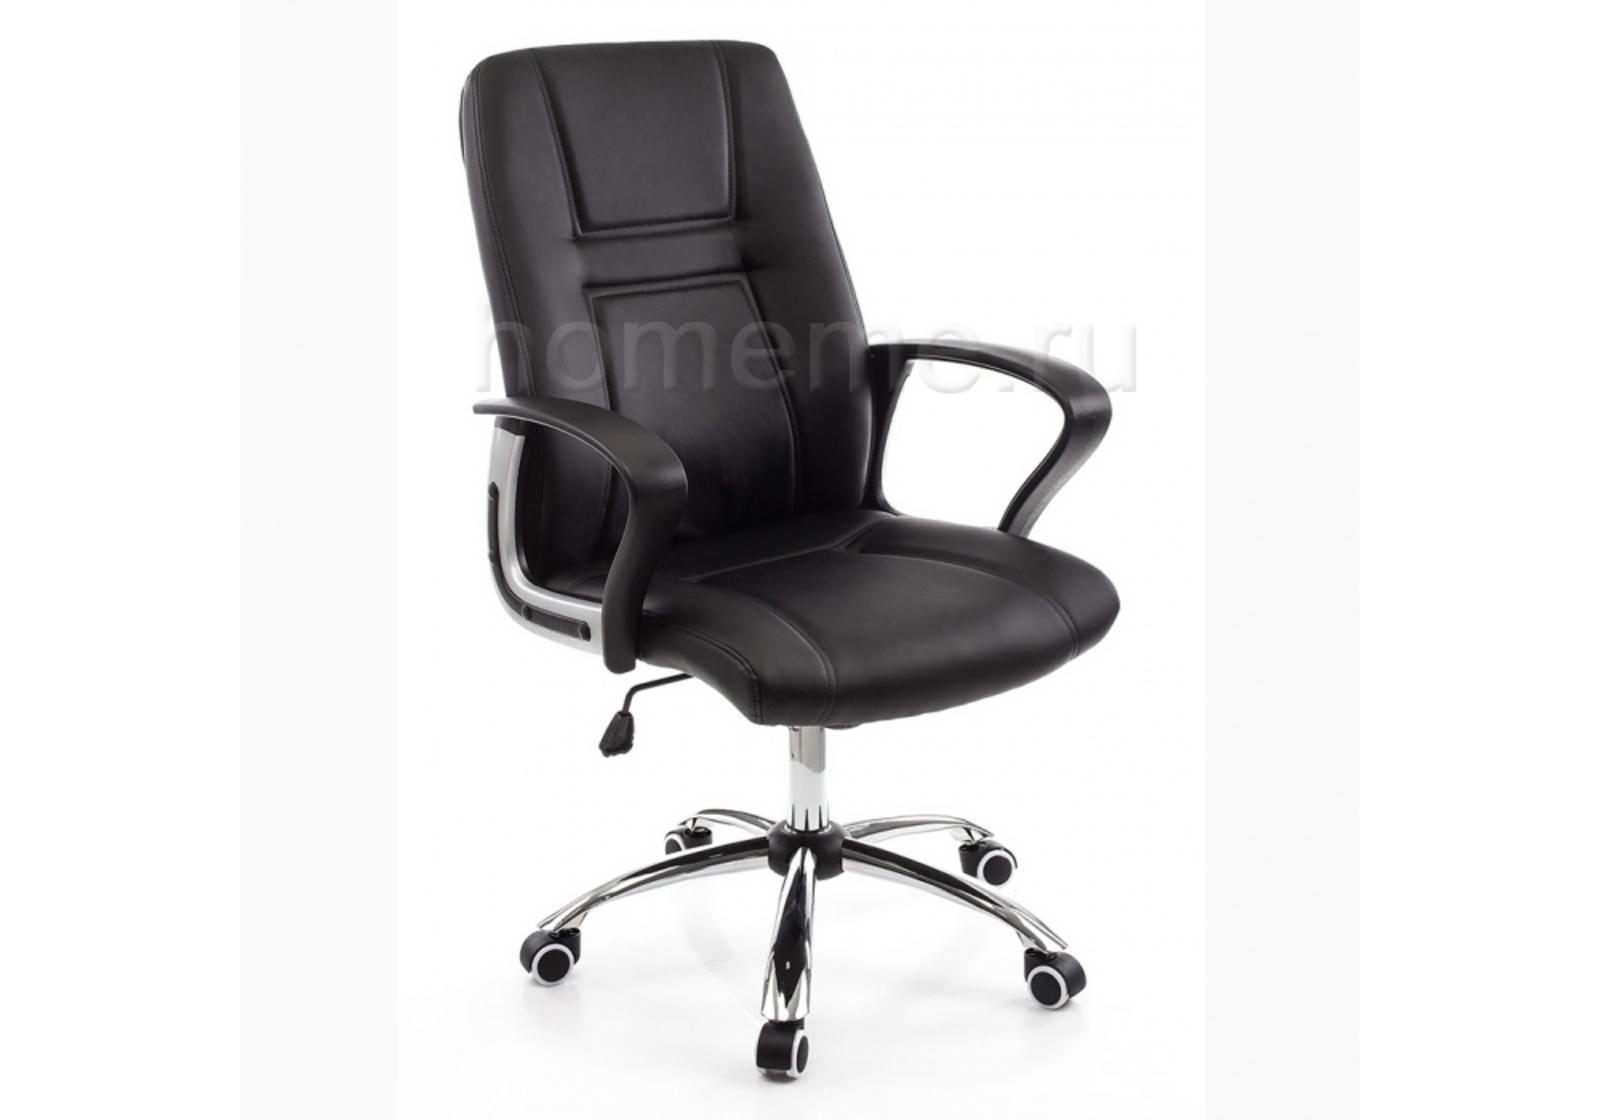 Кресло для офиса HomeMe Blanes черное 1733 от Homeme.ru